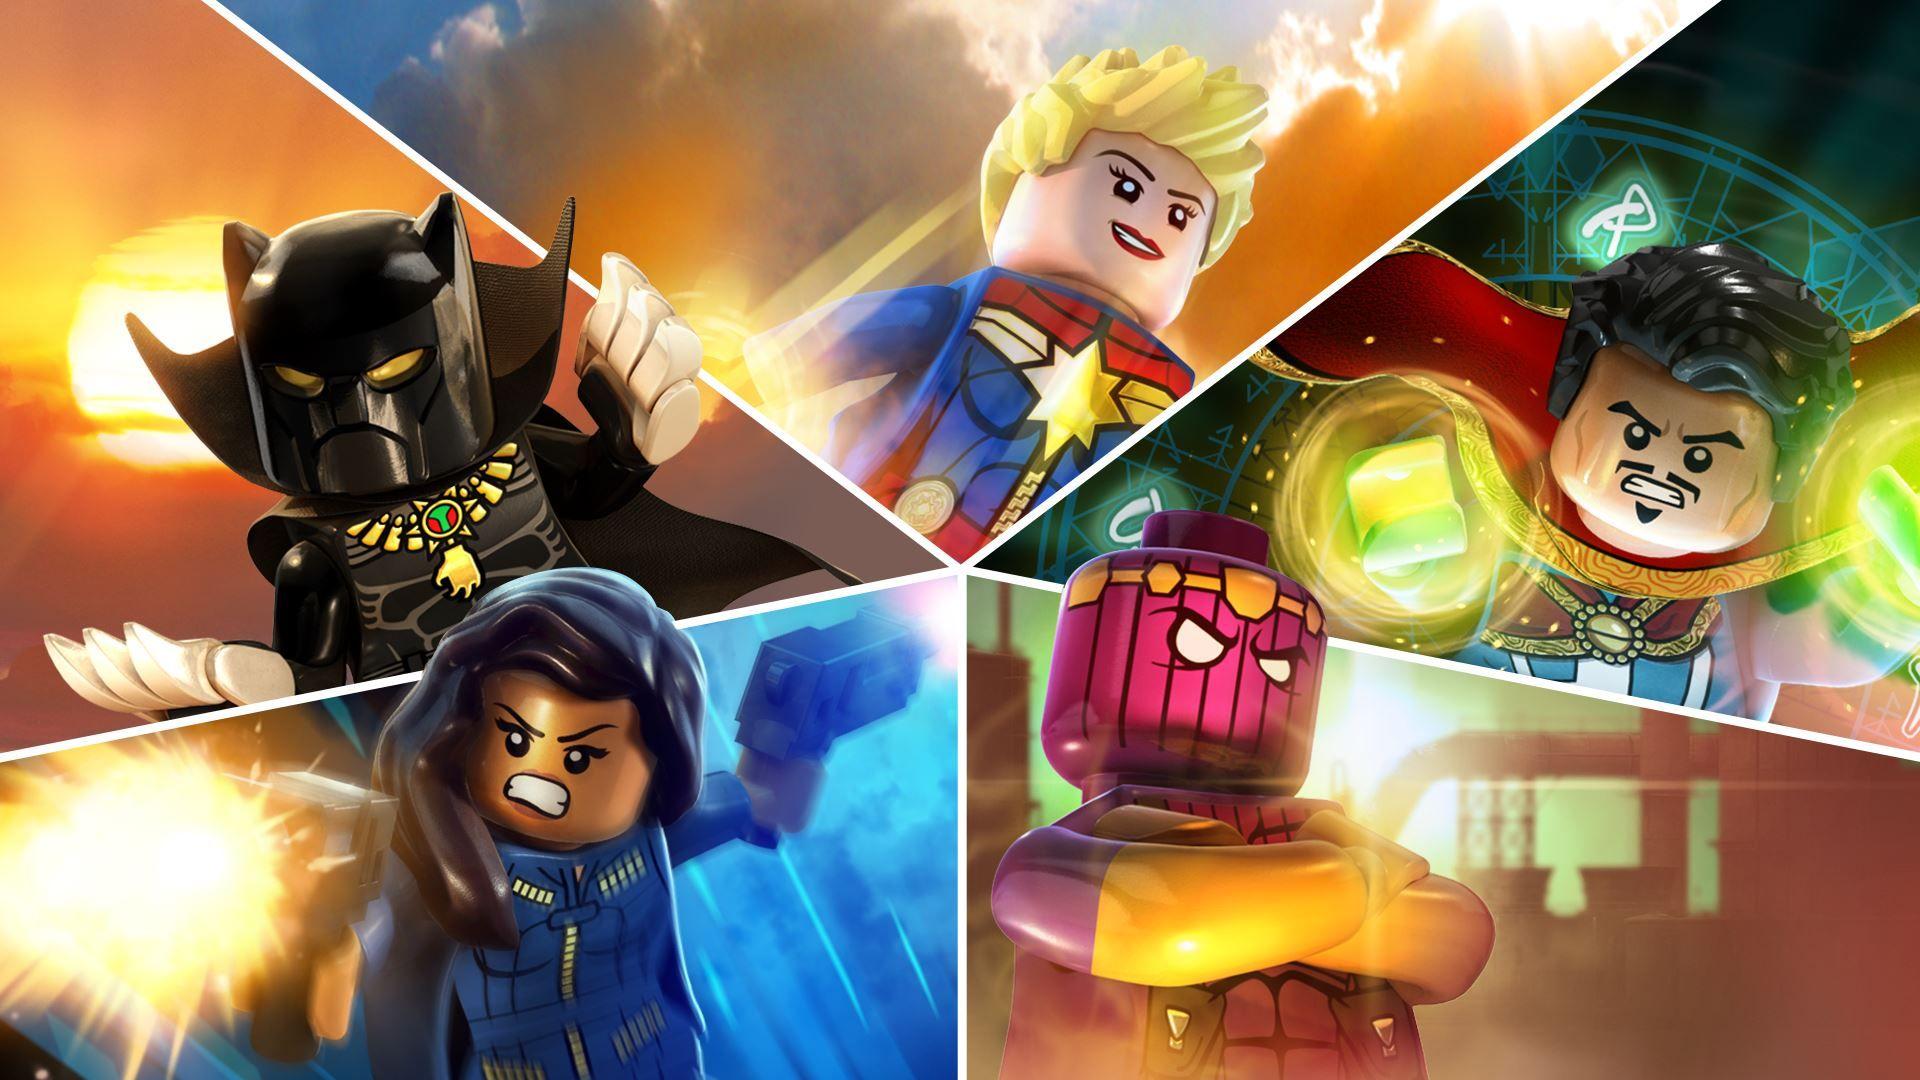 Lego marvels avengers game ps playstation 1600900 lego marvels lego marvels avengers game ps playstation 1600900 lego marvels avengers wallpapers 28 voltagebd Gallery